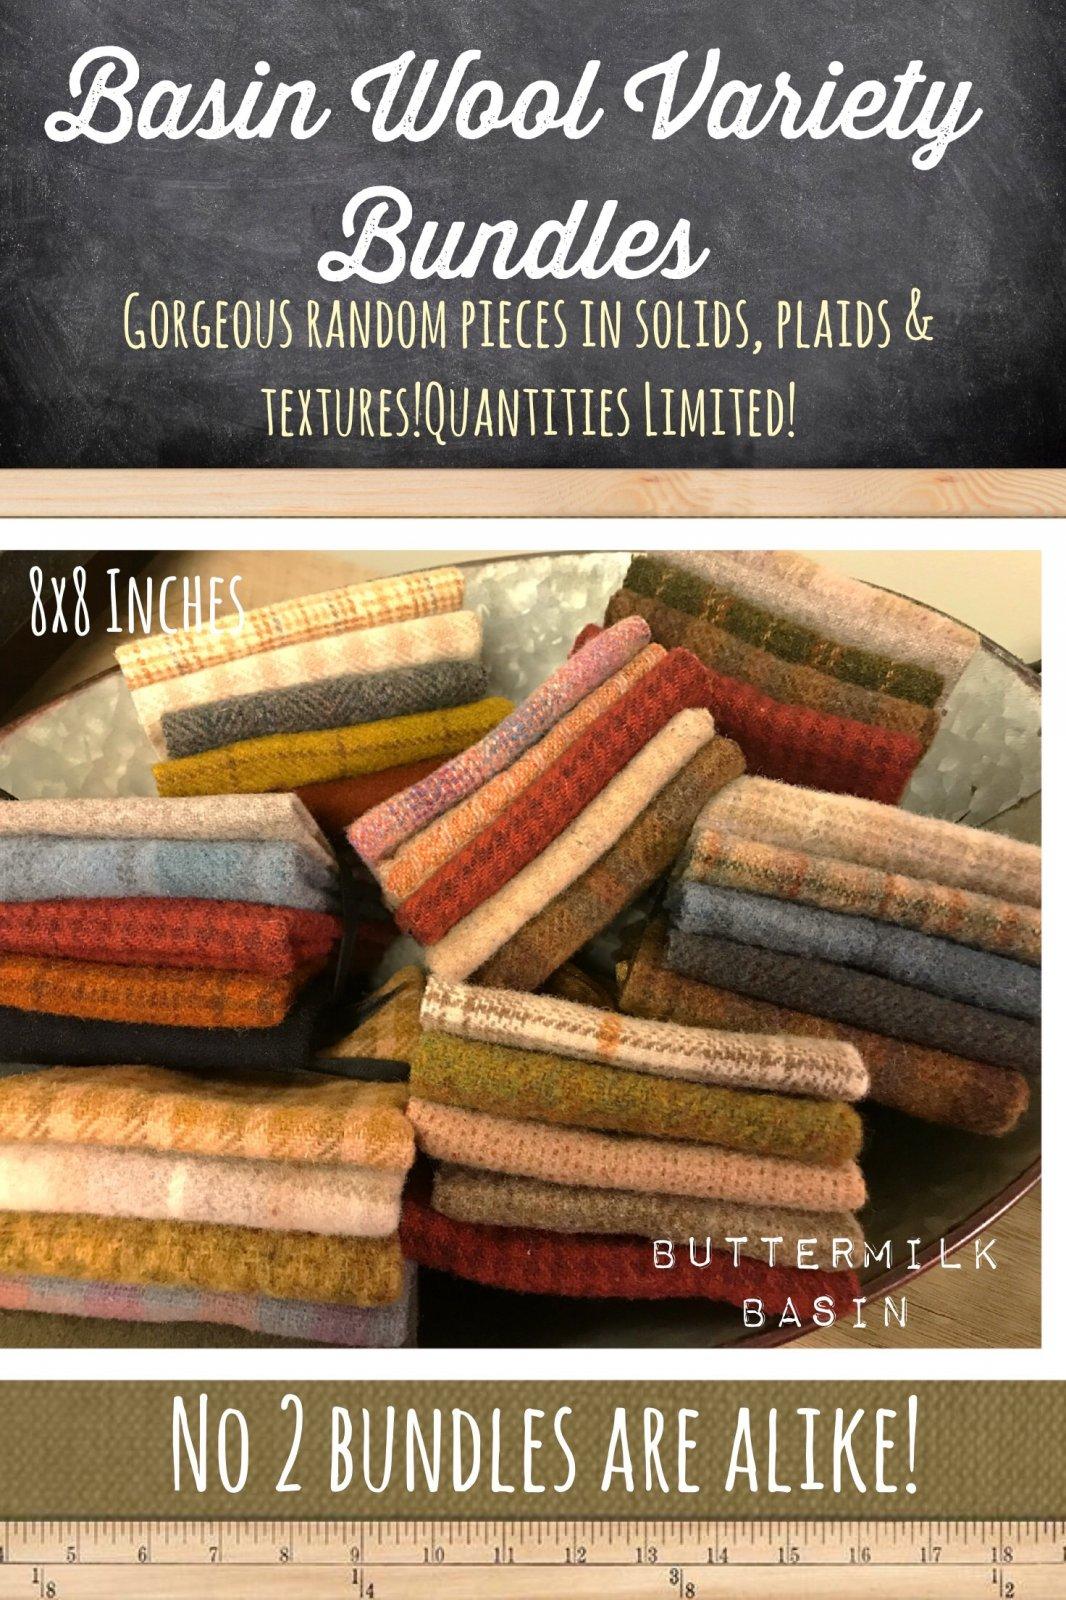 Basin Wool Variety Bundles